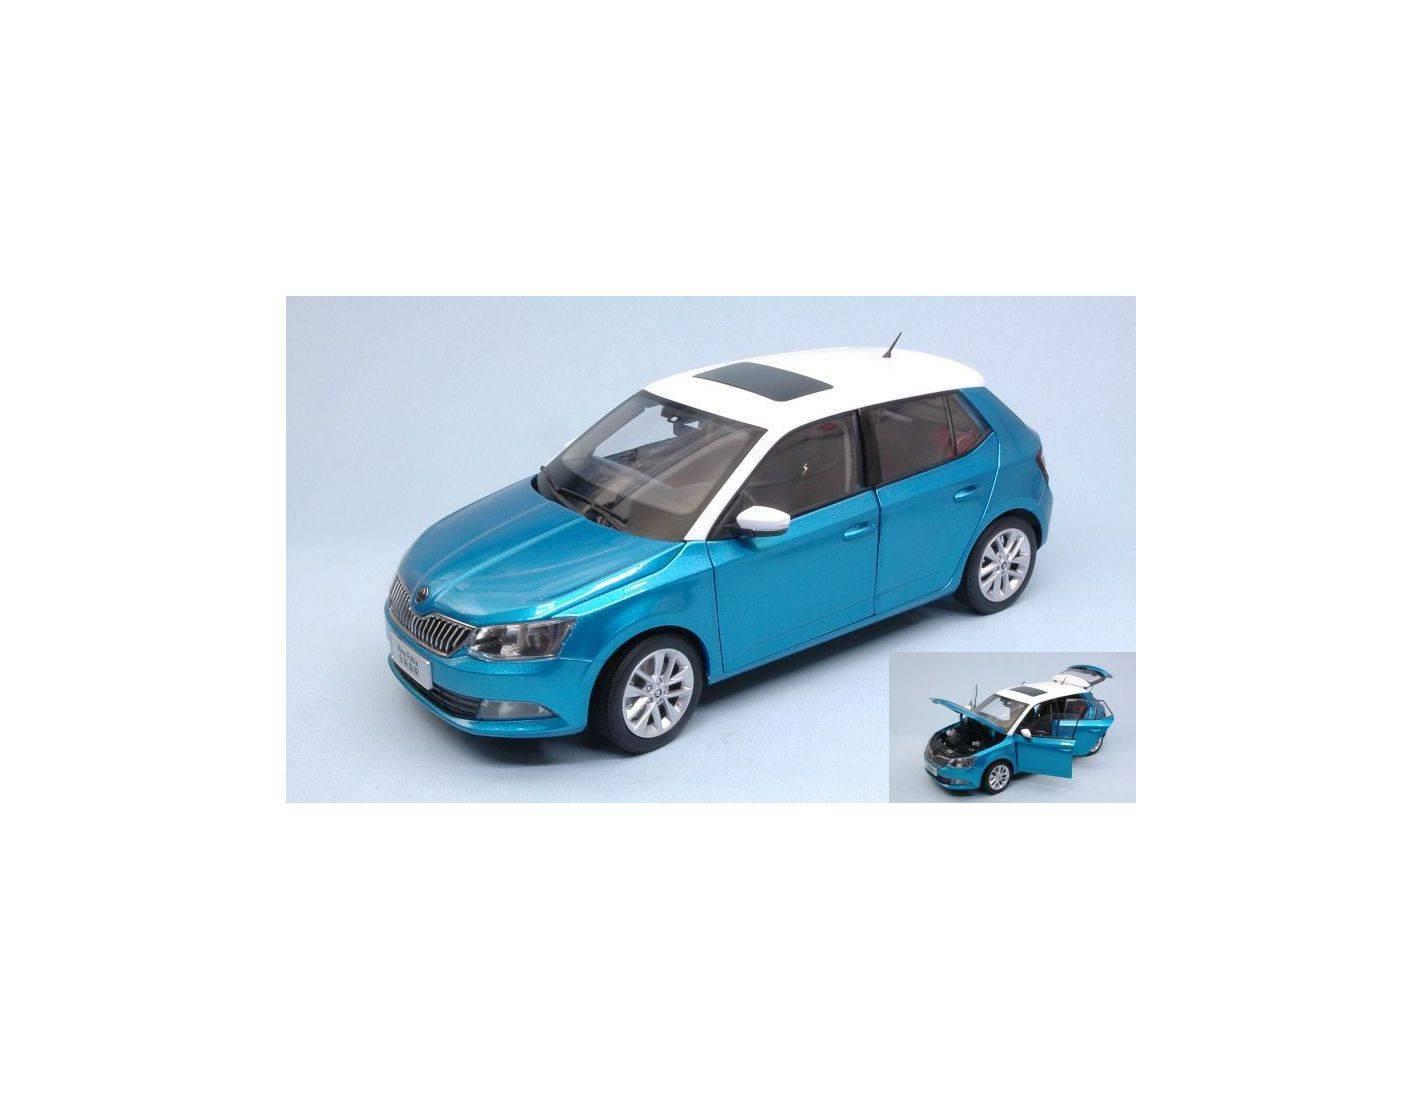 Abrex AB18034SK SKODA FABIA III 2015 BLUE METALLIC 1:18 Modellino